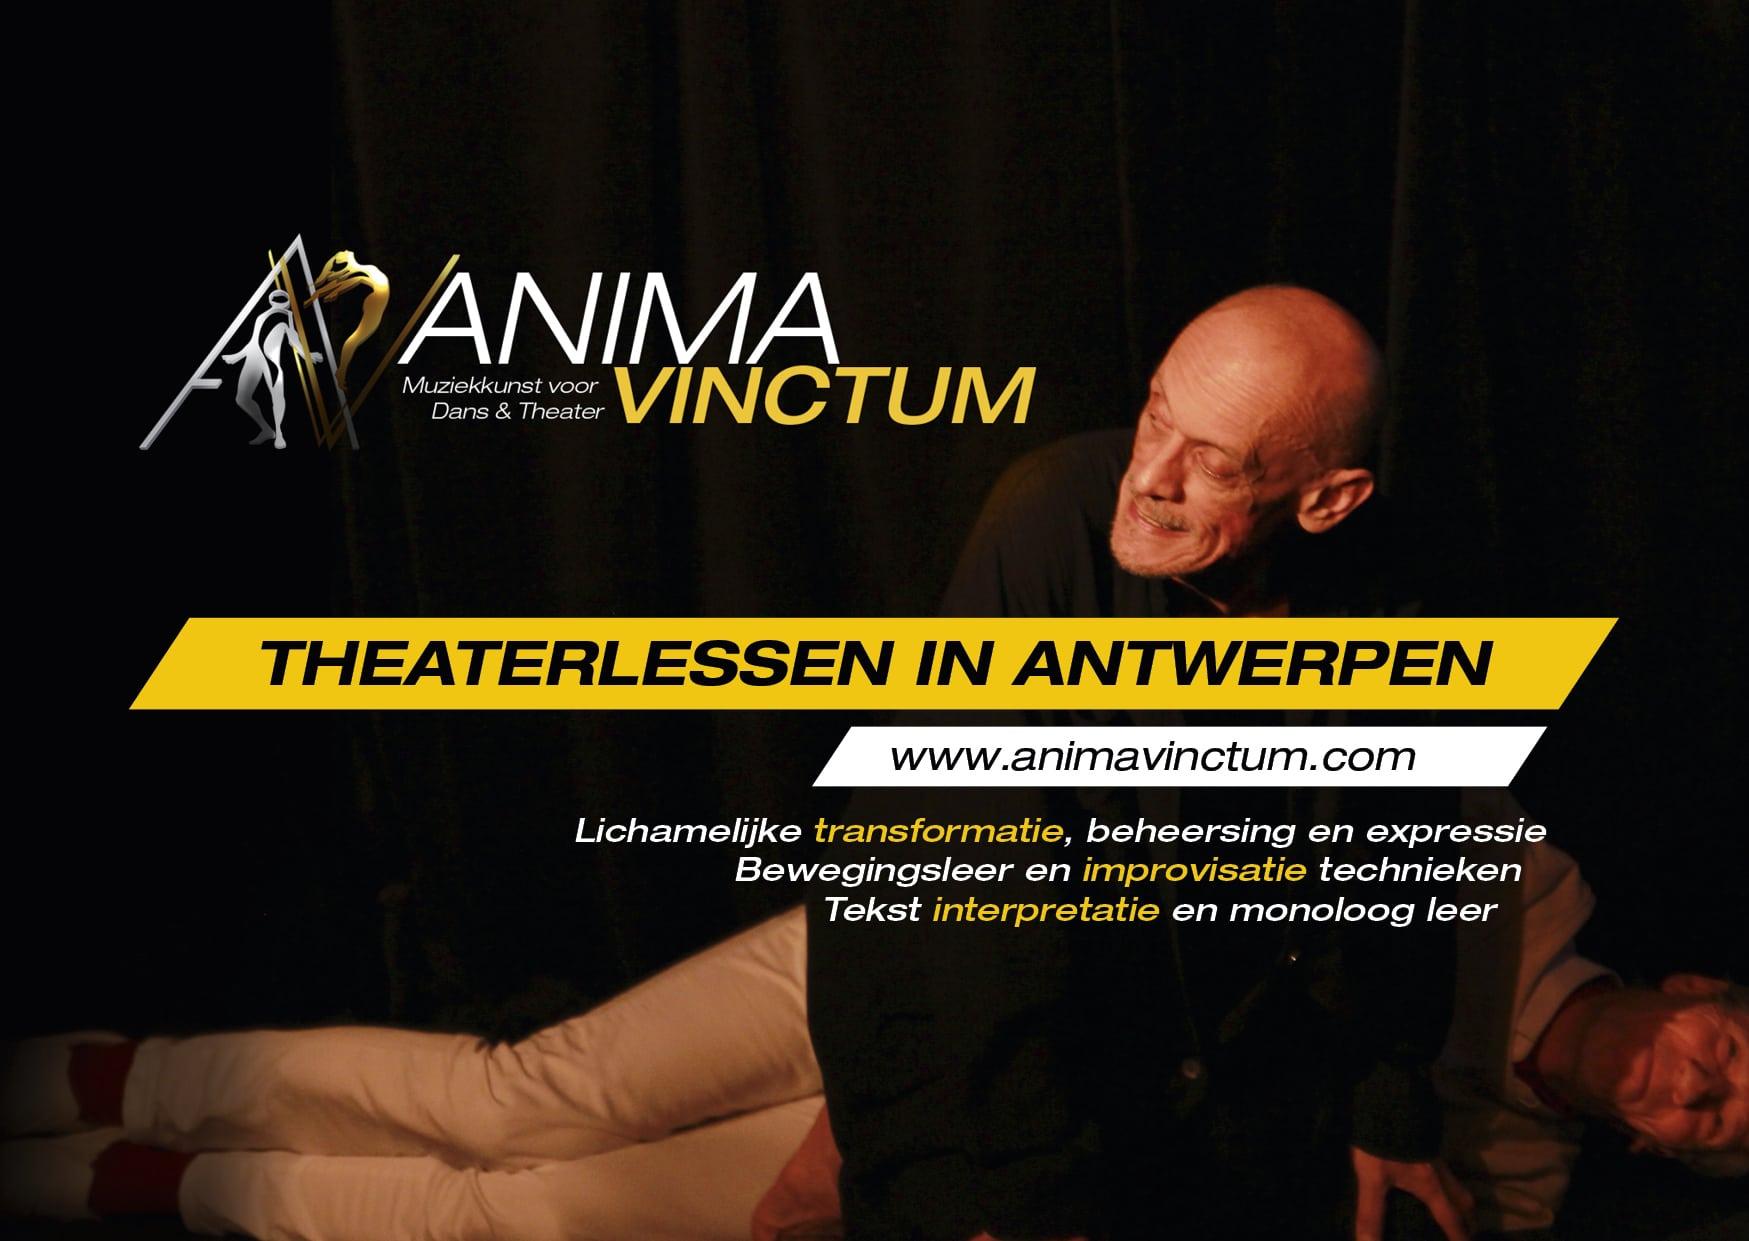 theatercursussen anima vinctum theaterlessen flyer voorkant